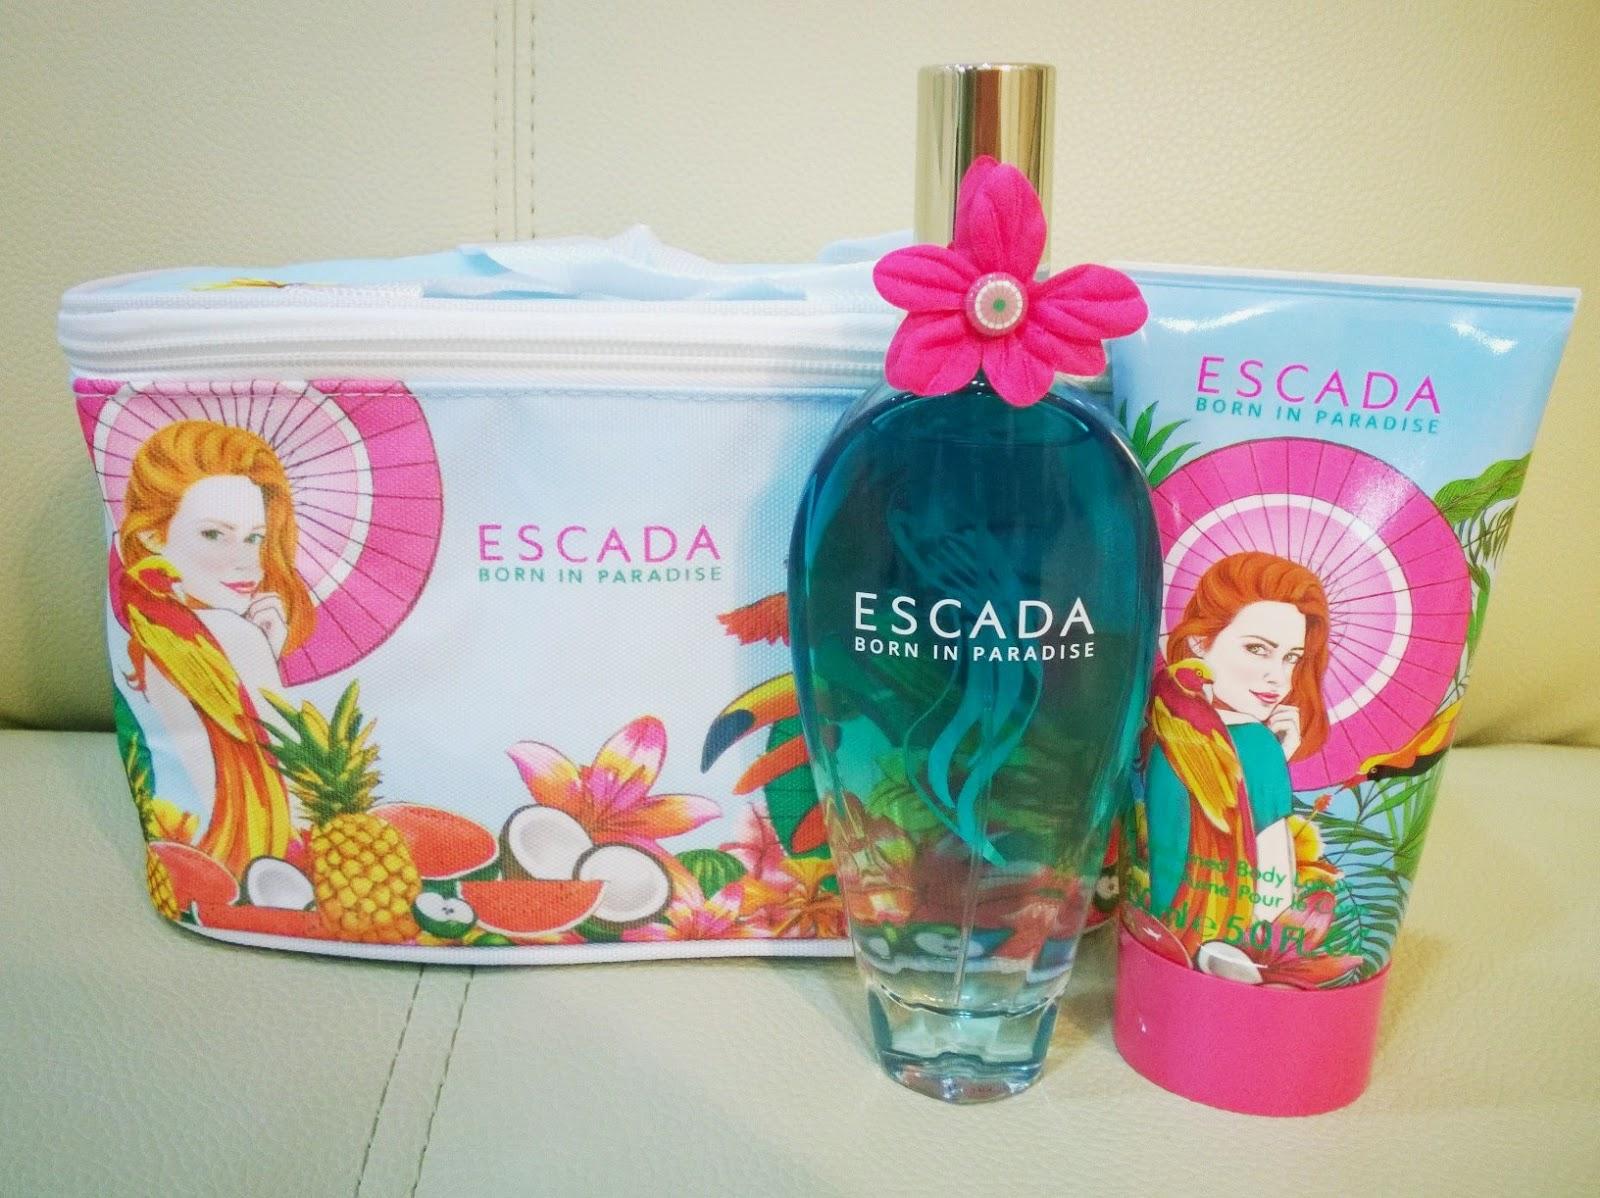 Escada Perfume Born In Paradise Price 60 Ans De Mariage Idee Cadeau